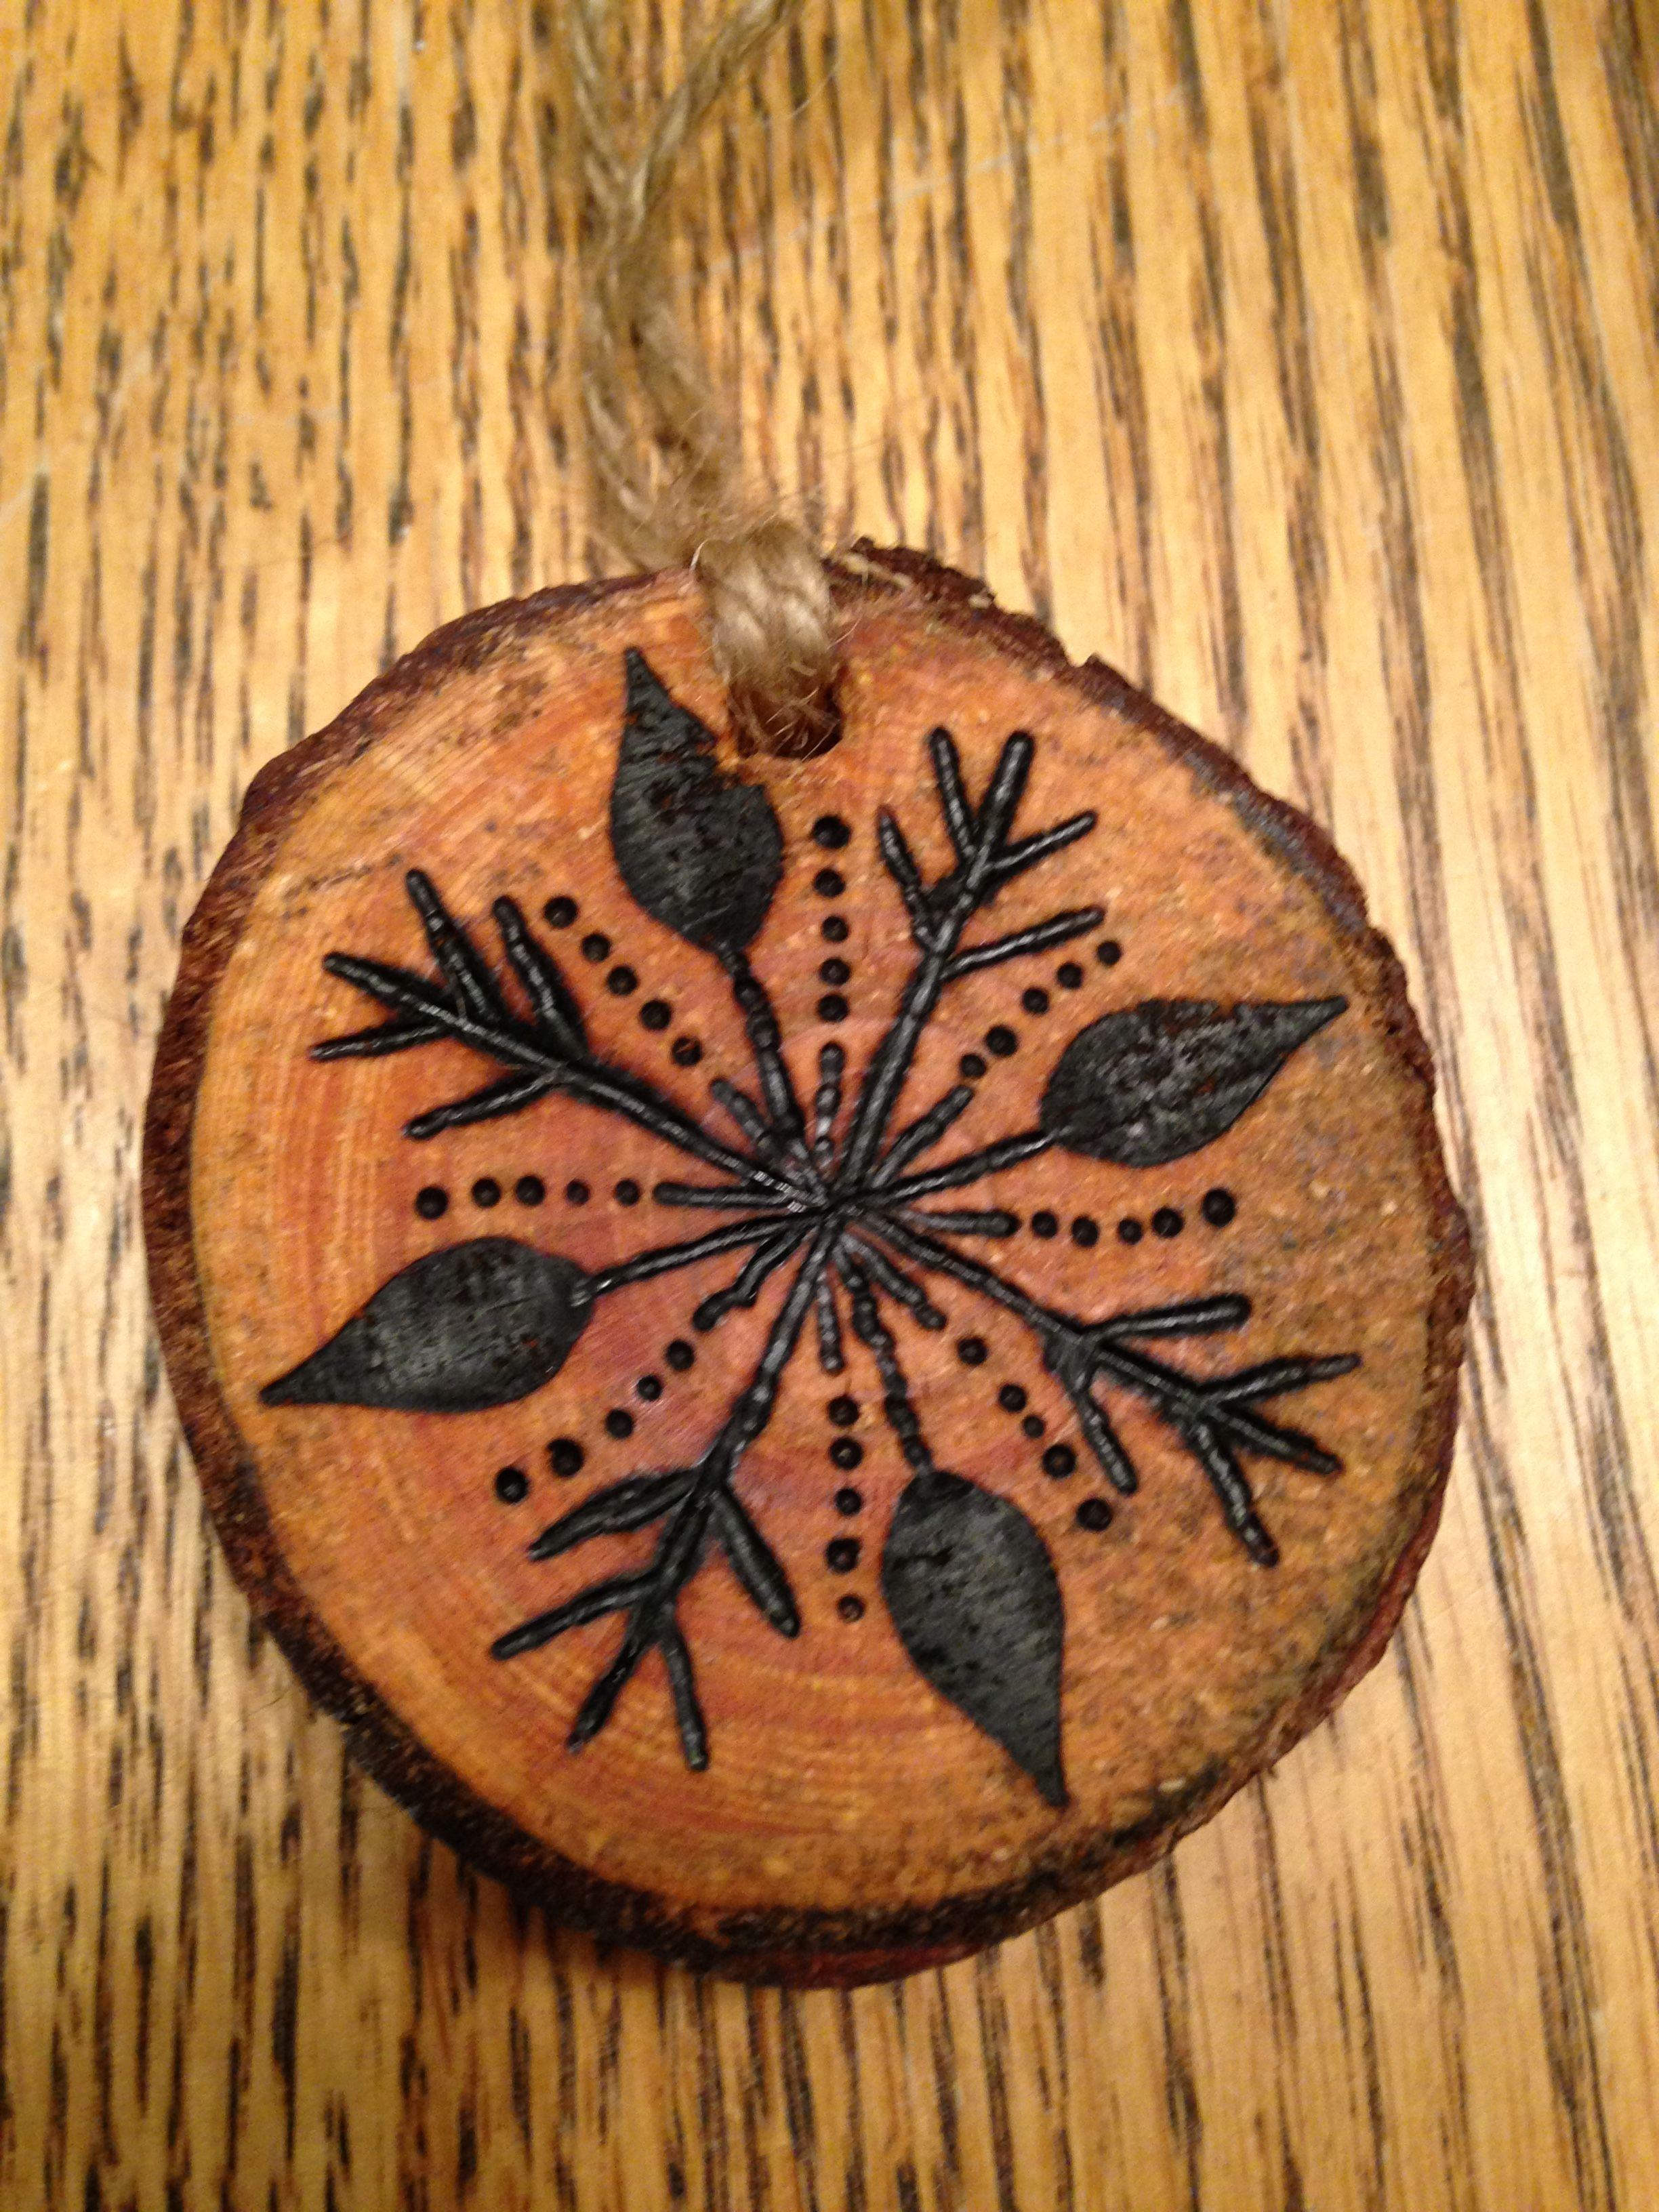 Rustic Snowflake Wood Burned Christmas Ornament Natural Wood Wood Burning Patterns Wood Burning Art Wood Ornaments